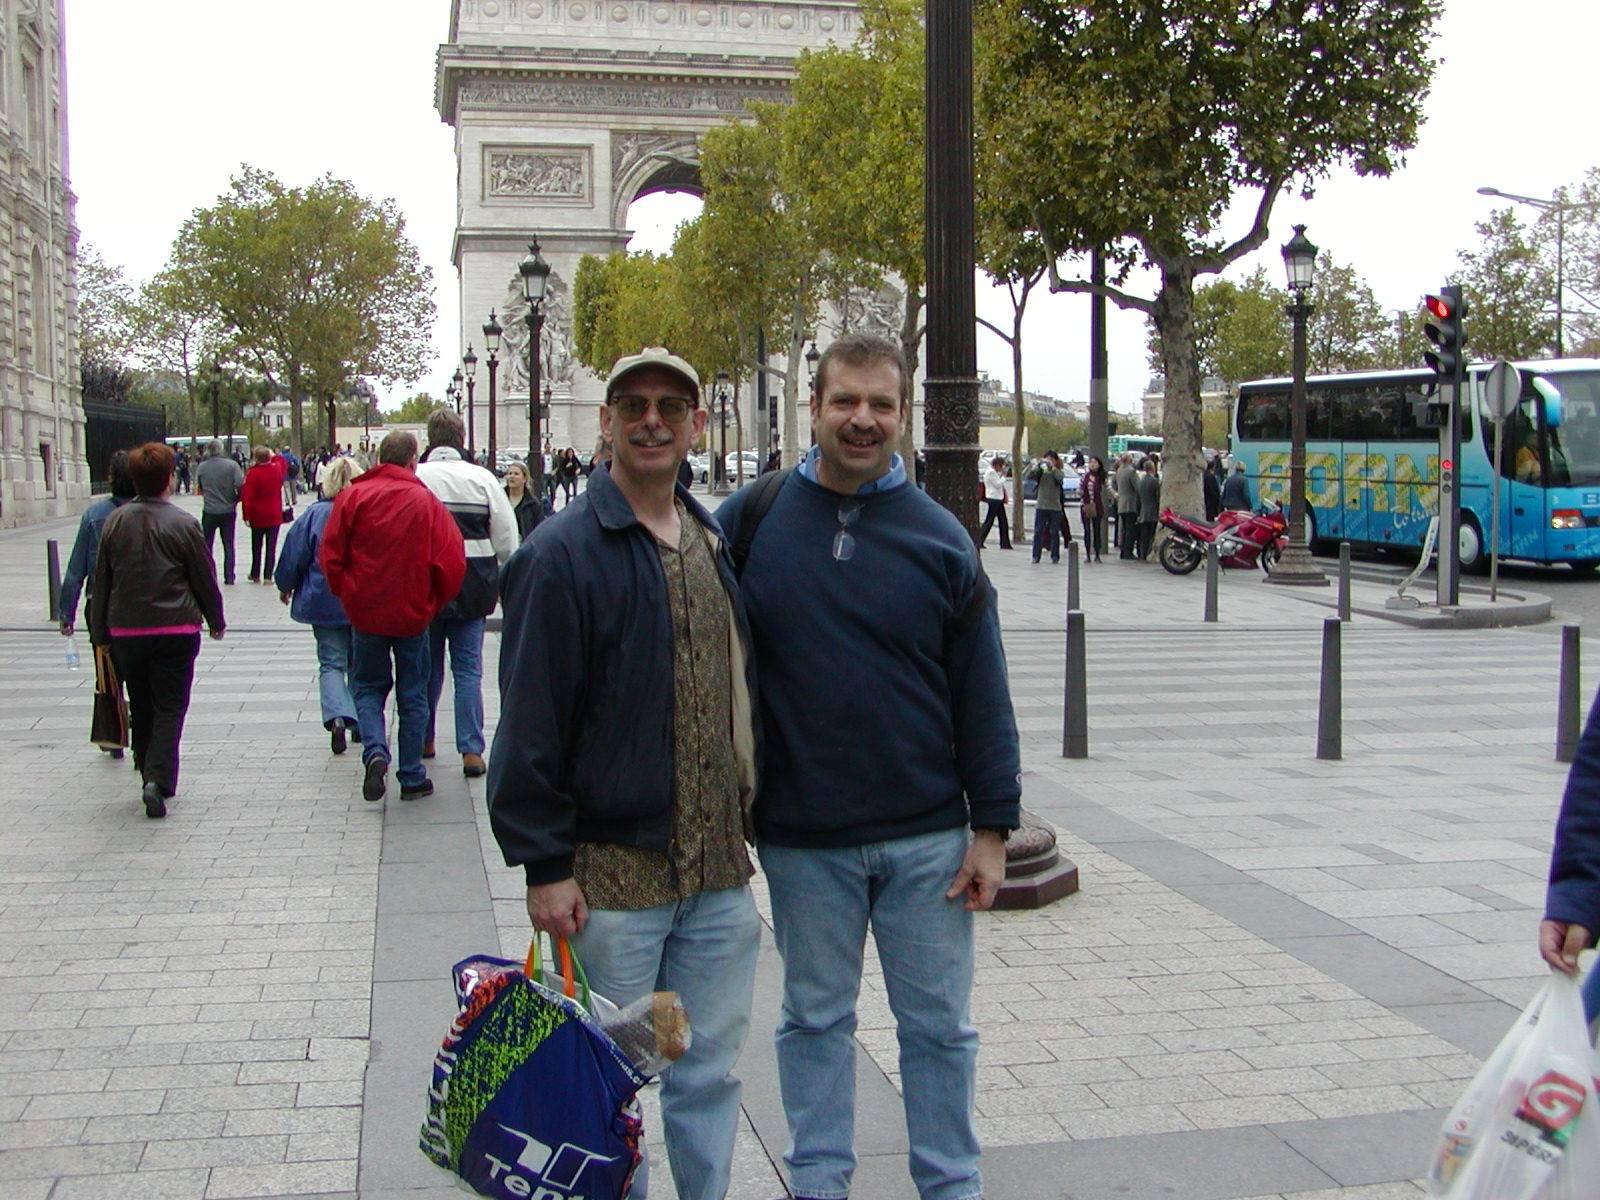 Vive La France! Mark and Eric